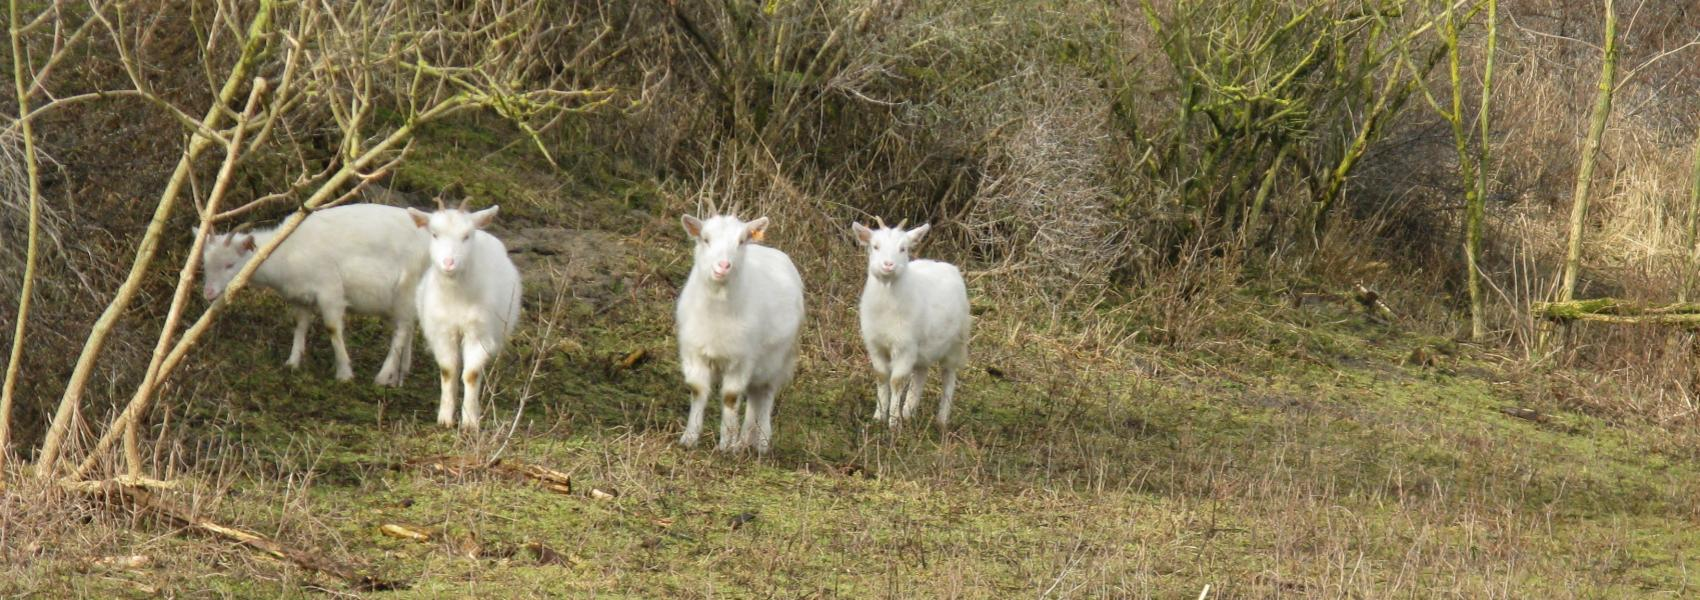 4 witte geitjes